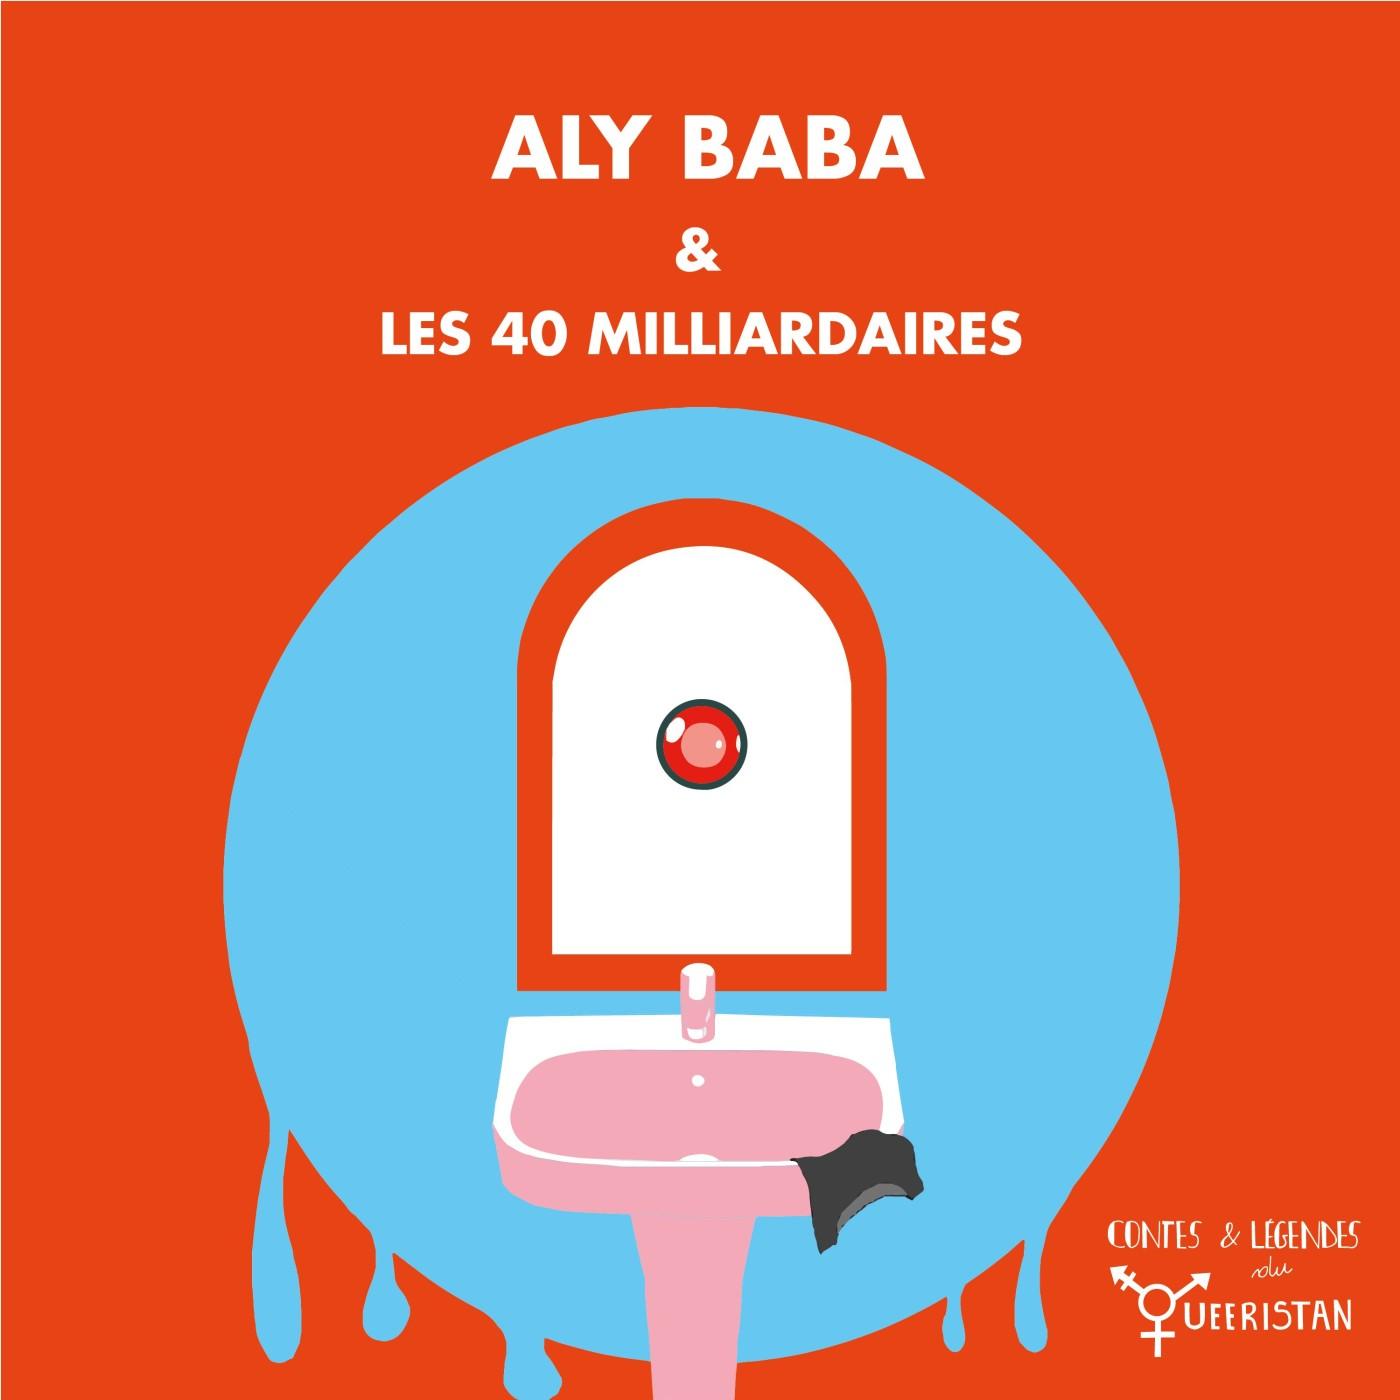 💣Aly Baba et les 40 milliardaires